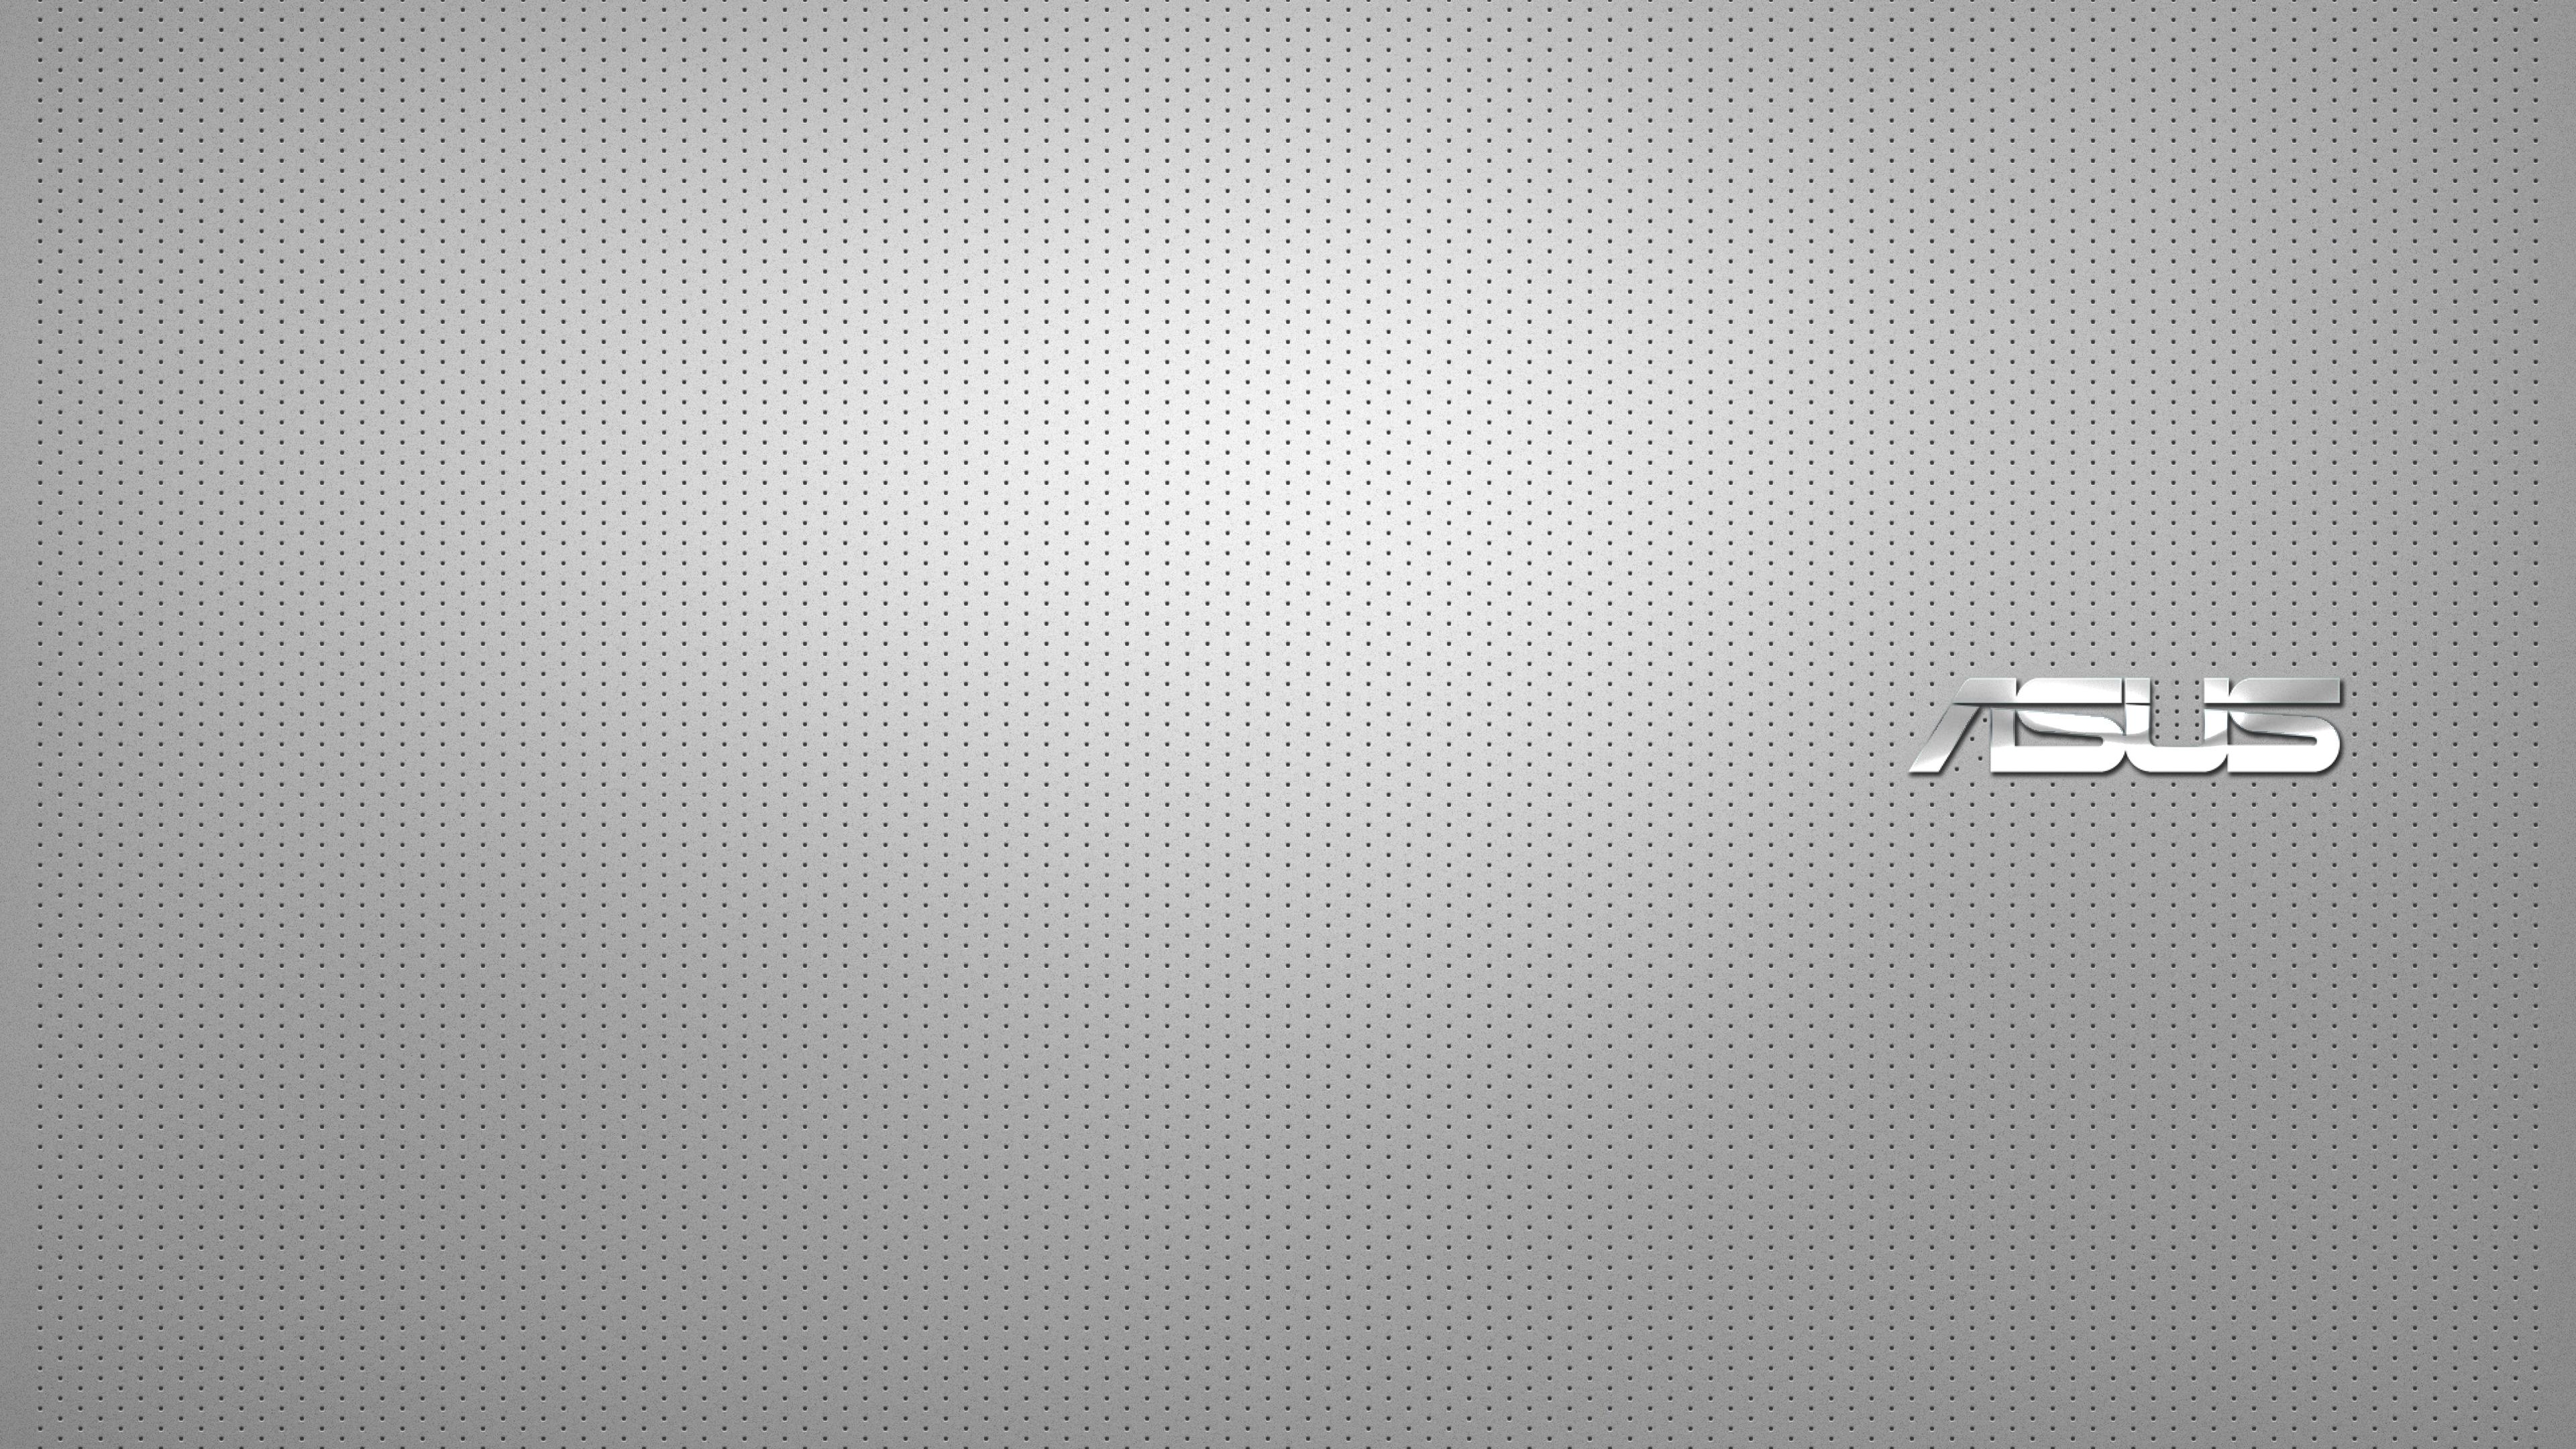 400+ Wallpaper Asus Grey HD Paling Keren